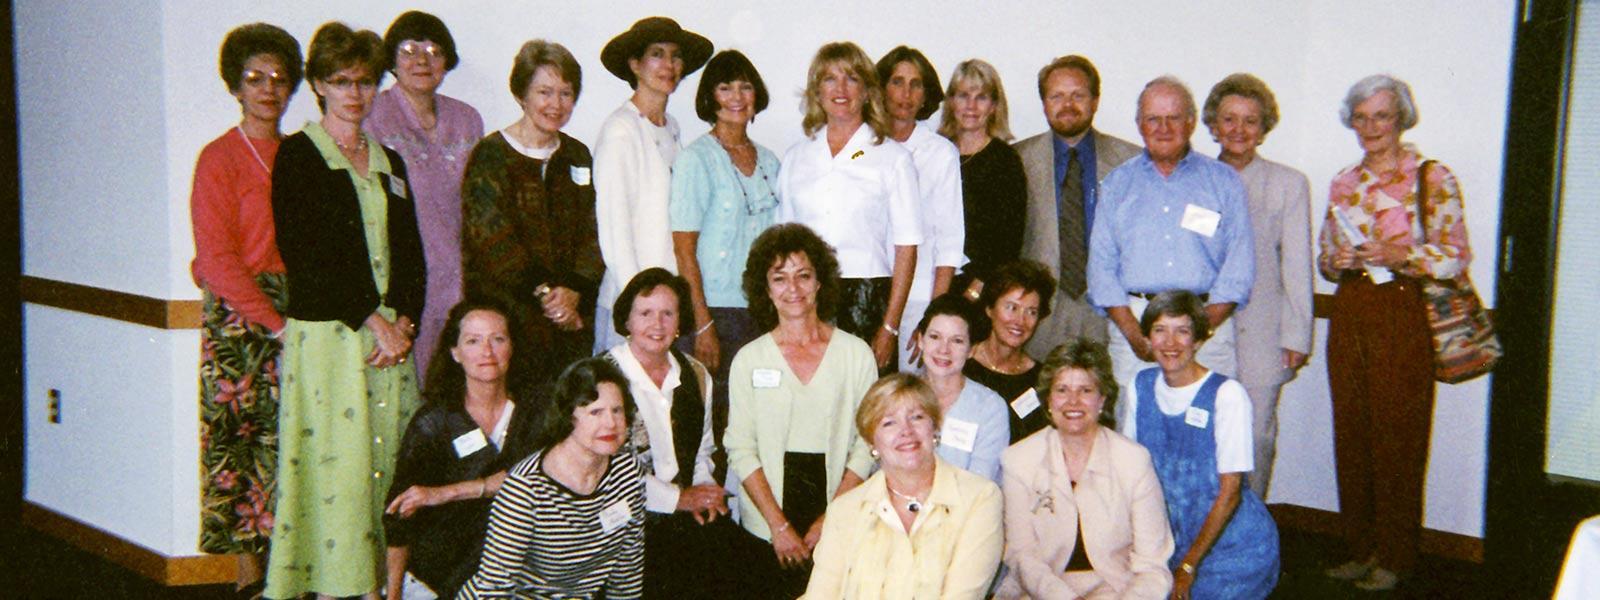 Associates members, 2000.